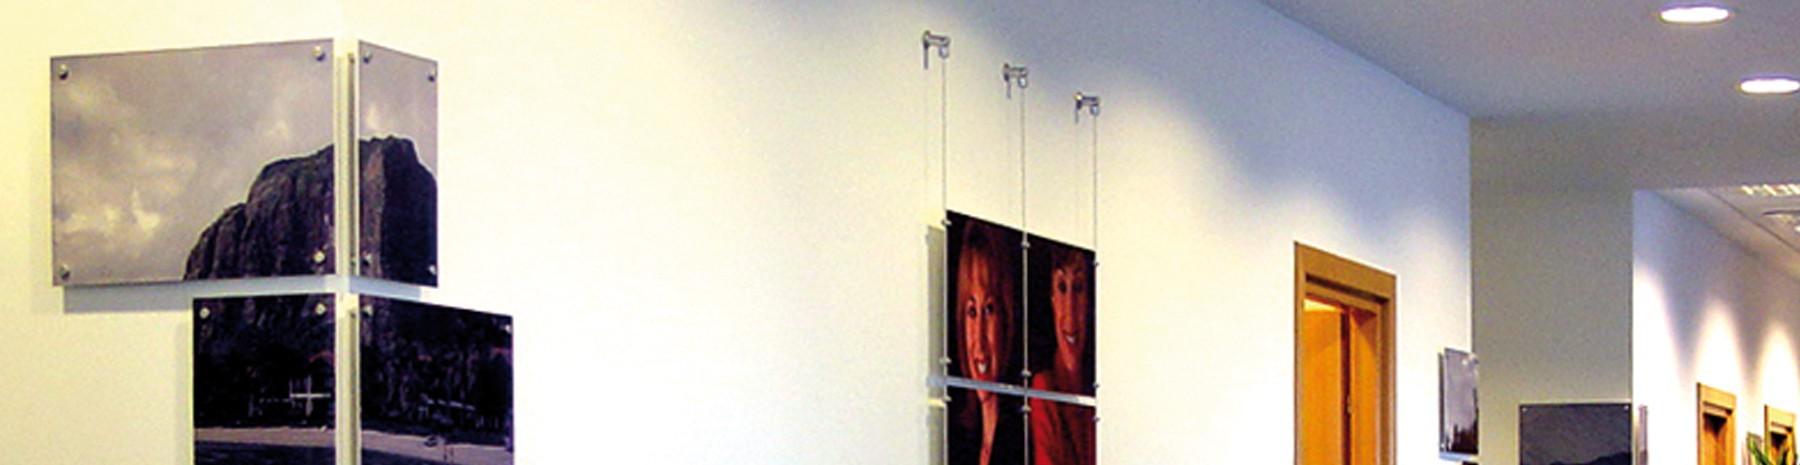 Gamme complète de produits en plexiglas: Protection en plexiglas